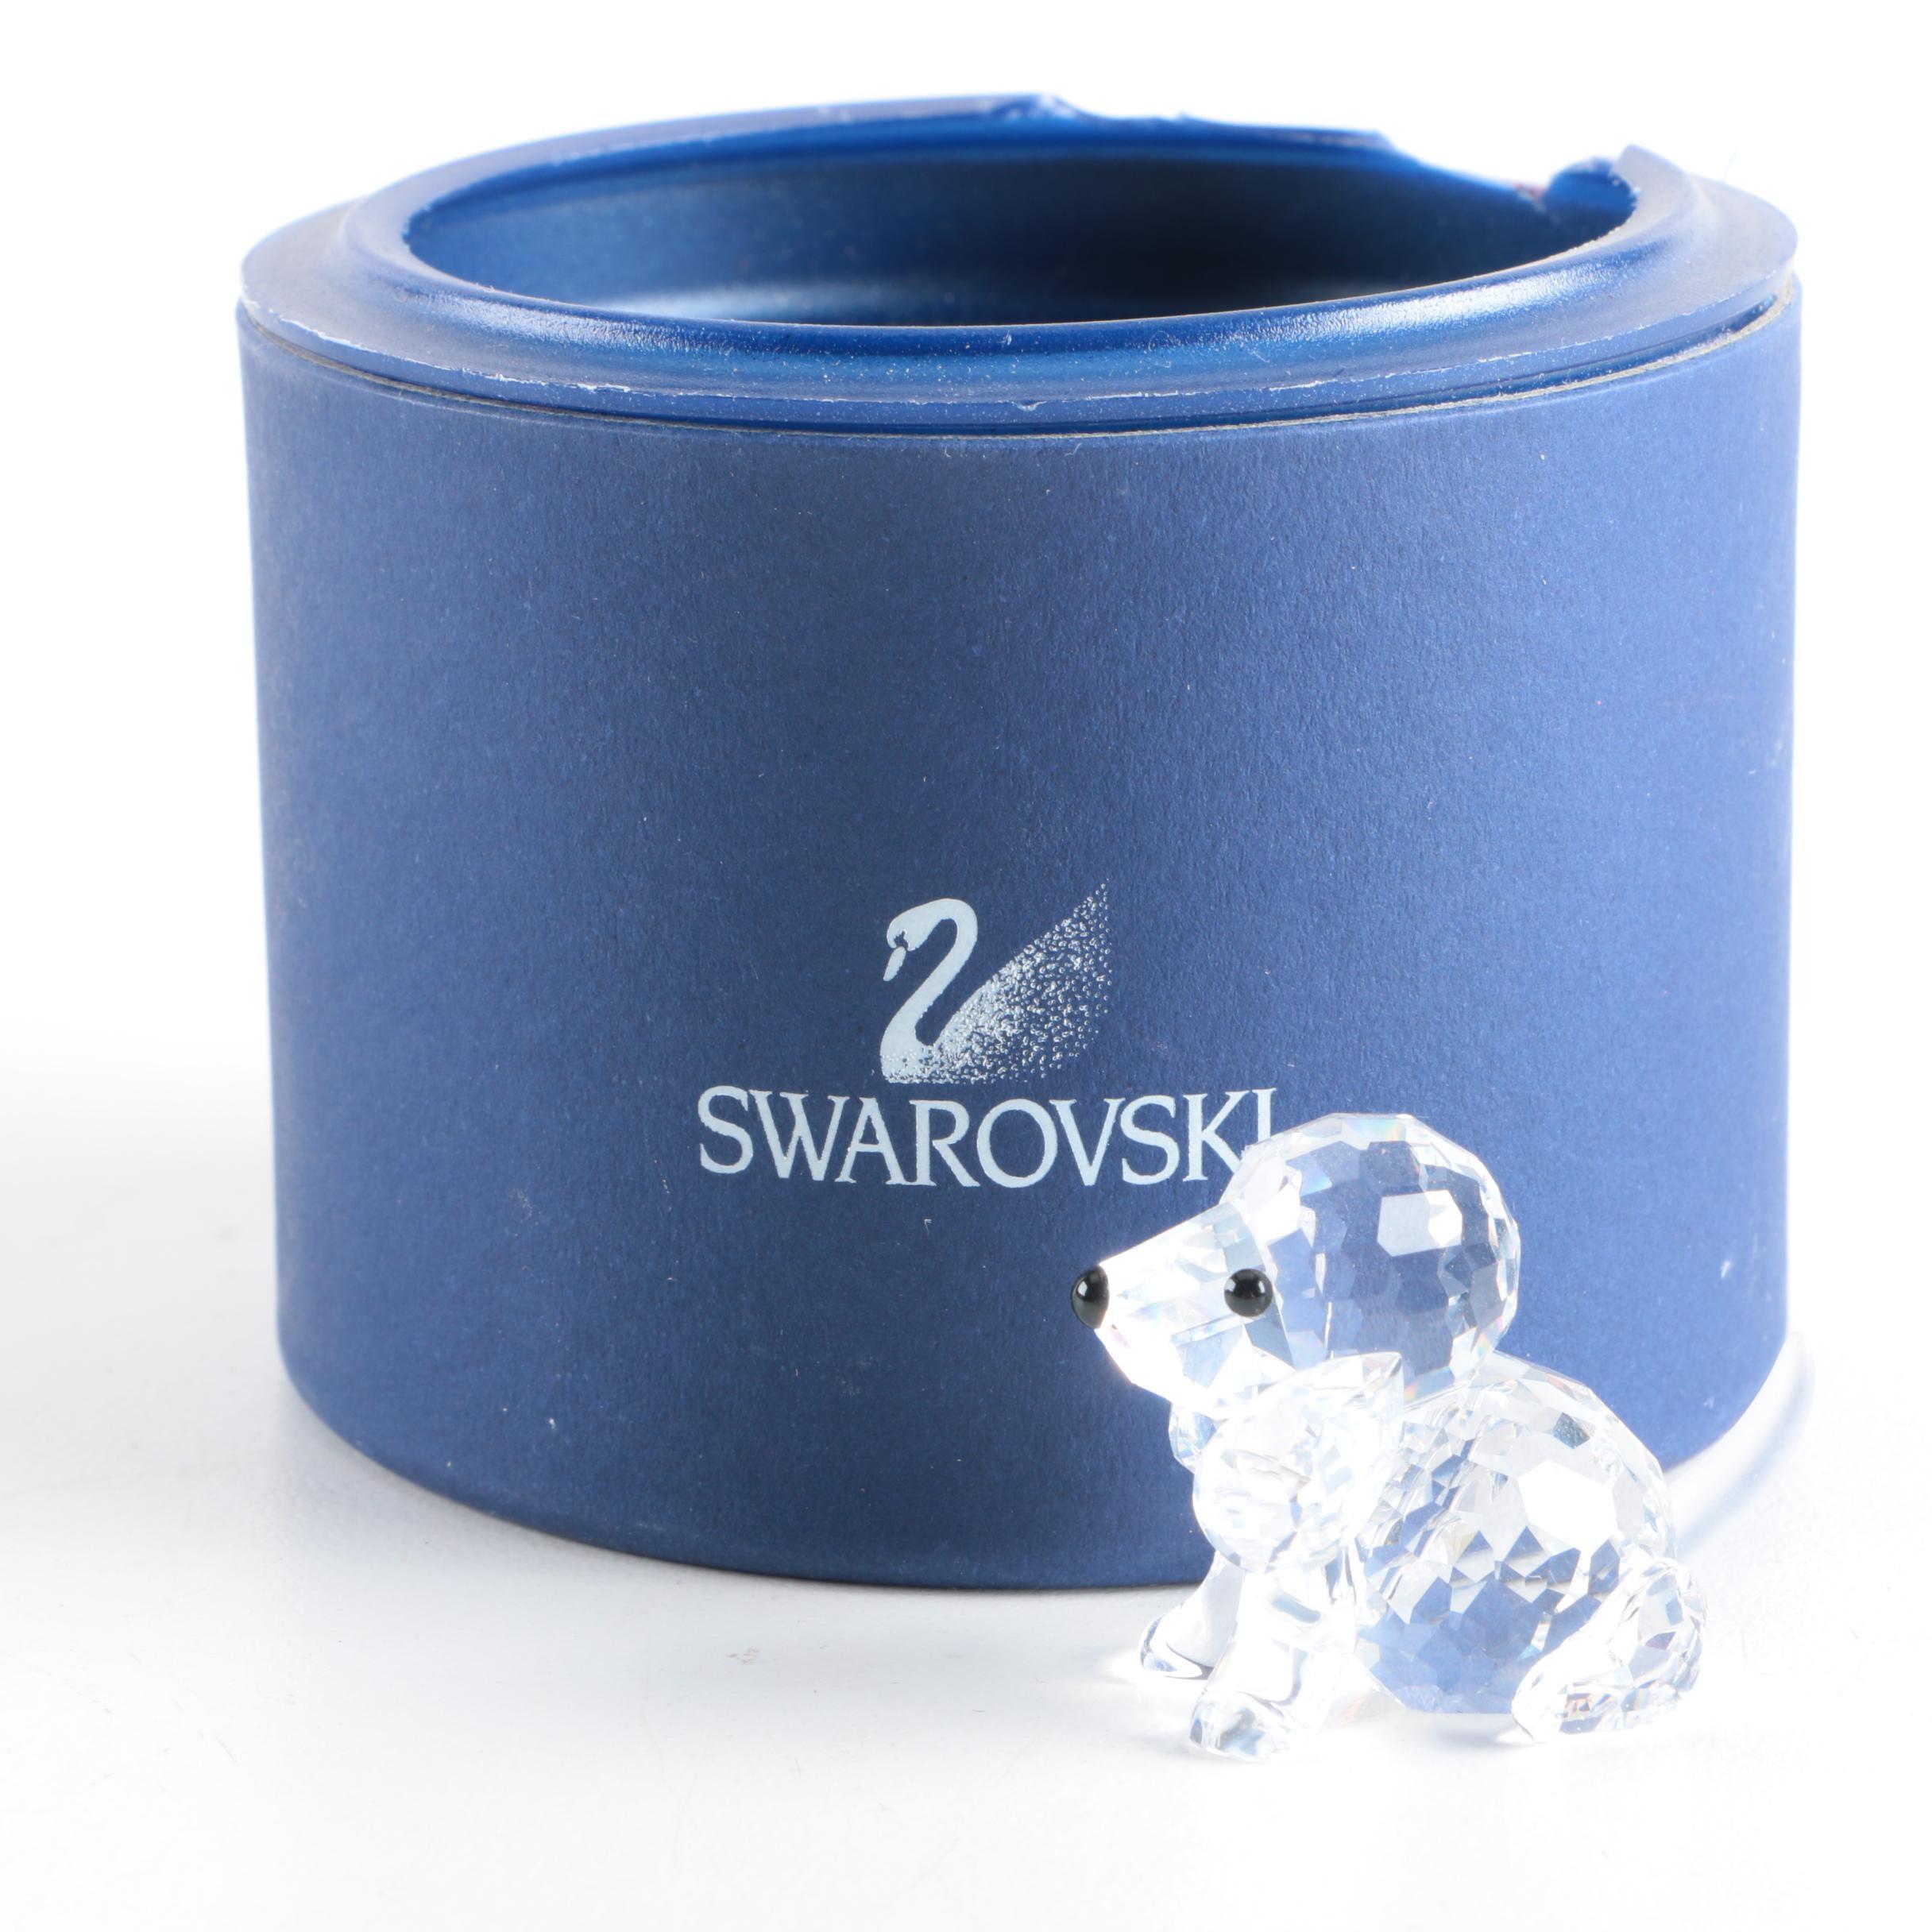 "Swarovski Crystal ""Sitting Beagle"" Figurine"